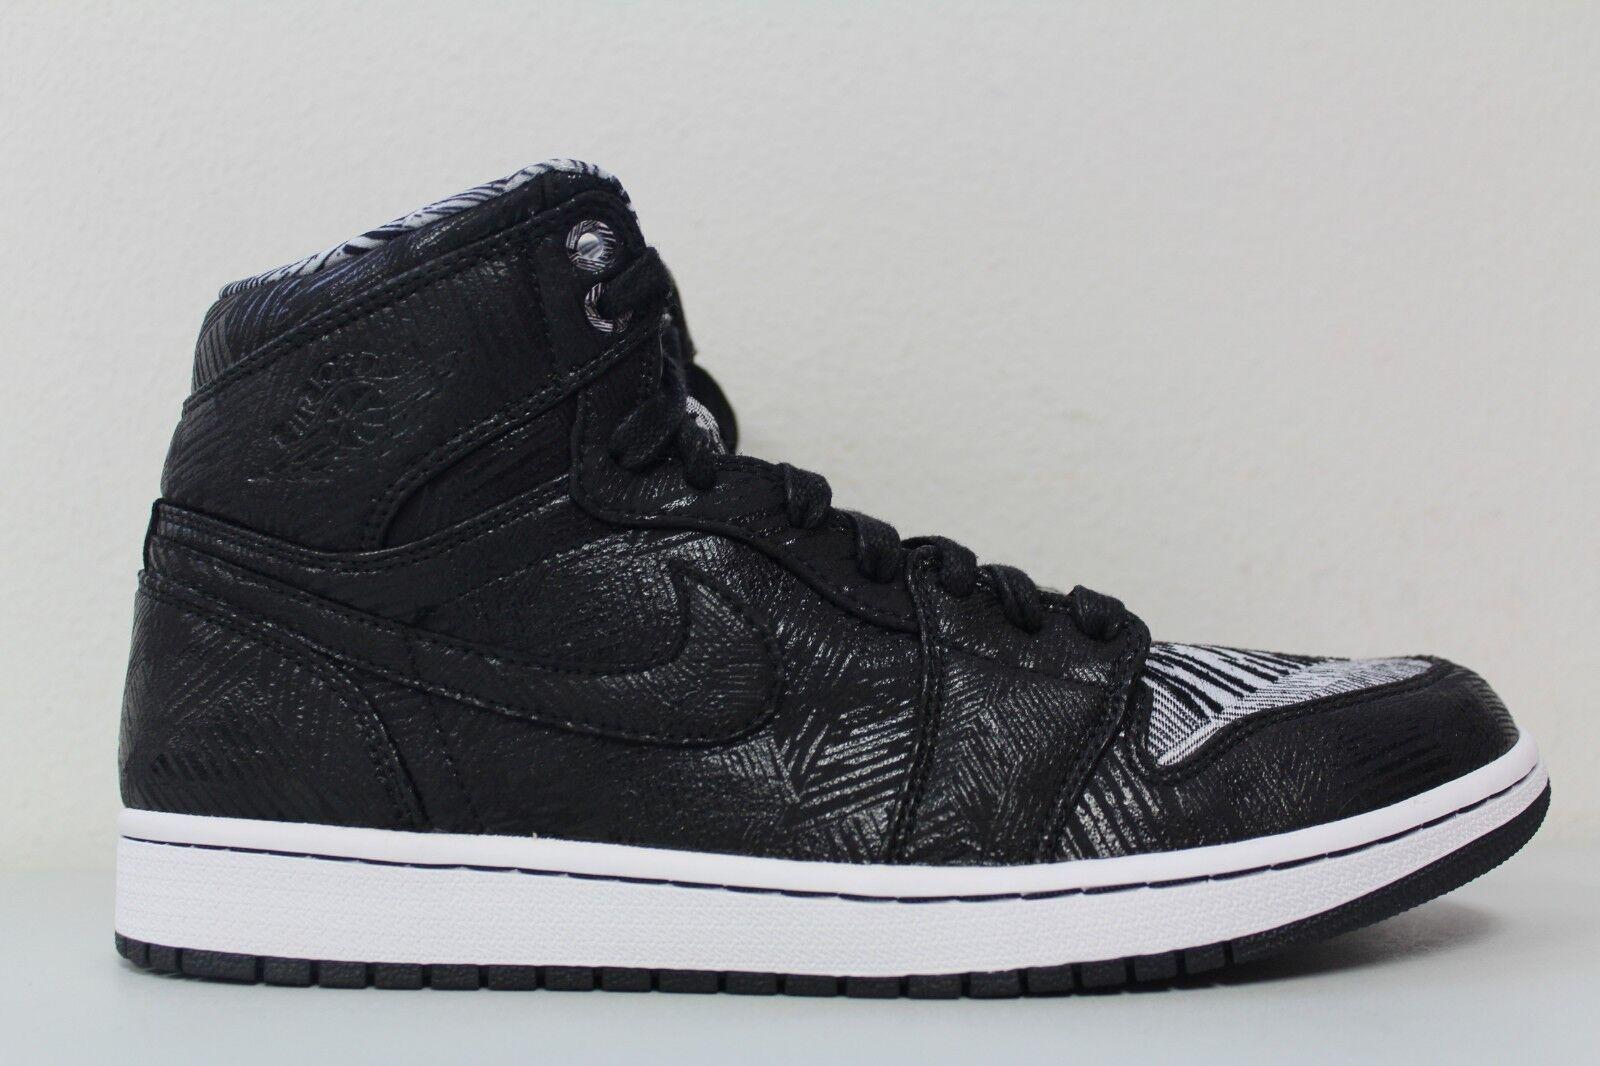 Nike Mens Air Jordan 1 High BHM Size 11 DS Black White 2015 Retro 579591-010